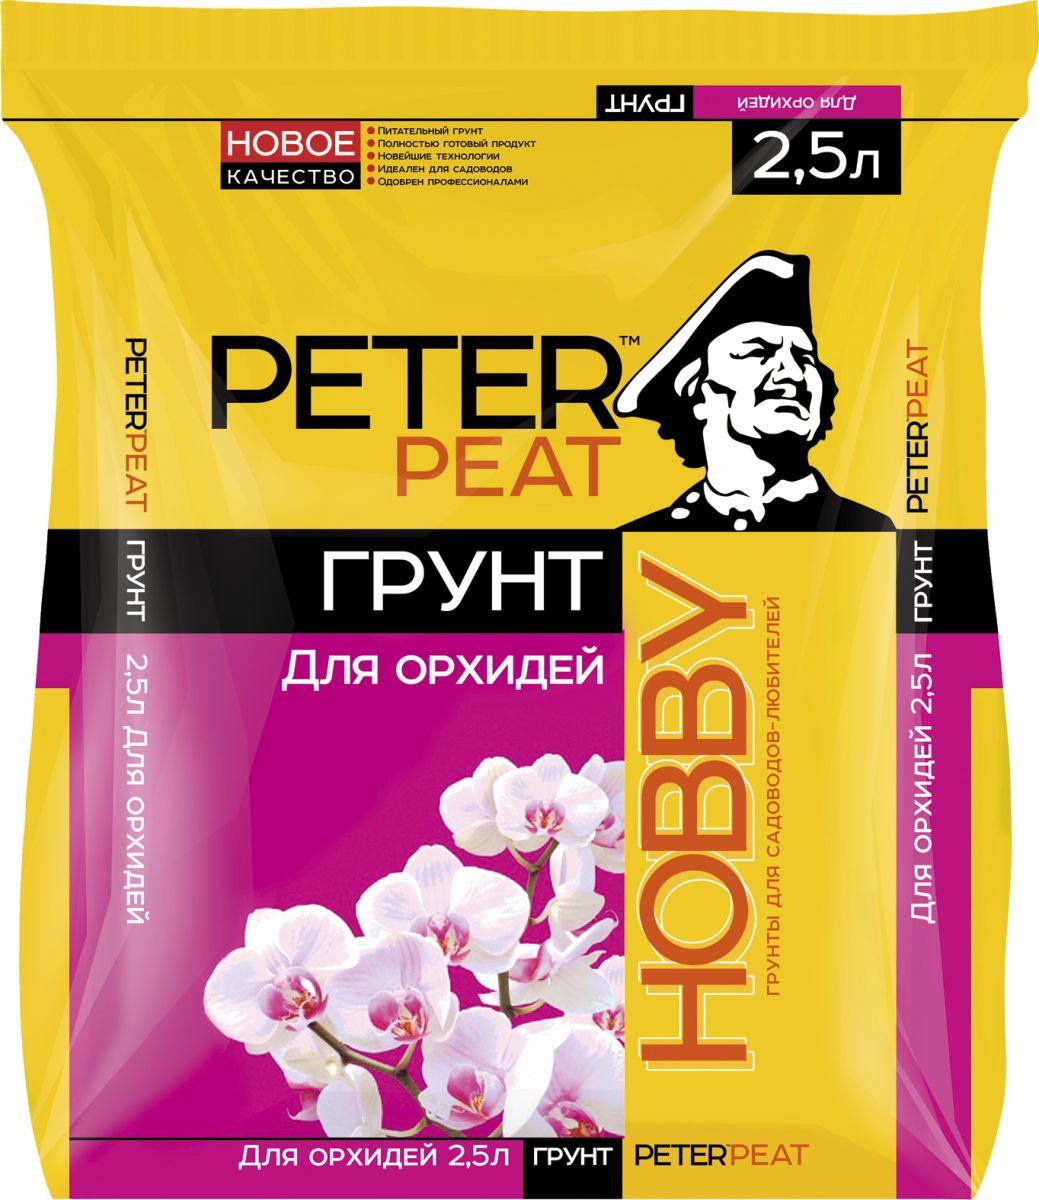 Грунт Peter Peat Линия Хобби Орхидея, 2,5 л торф peter peat для дачных туалетов 20 л